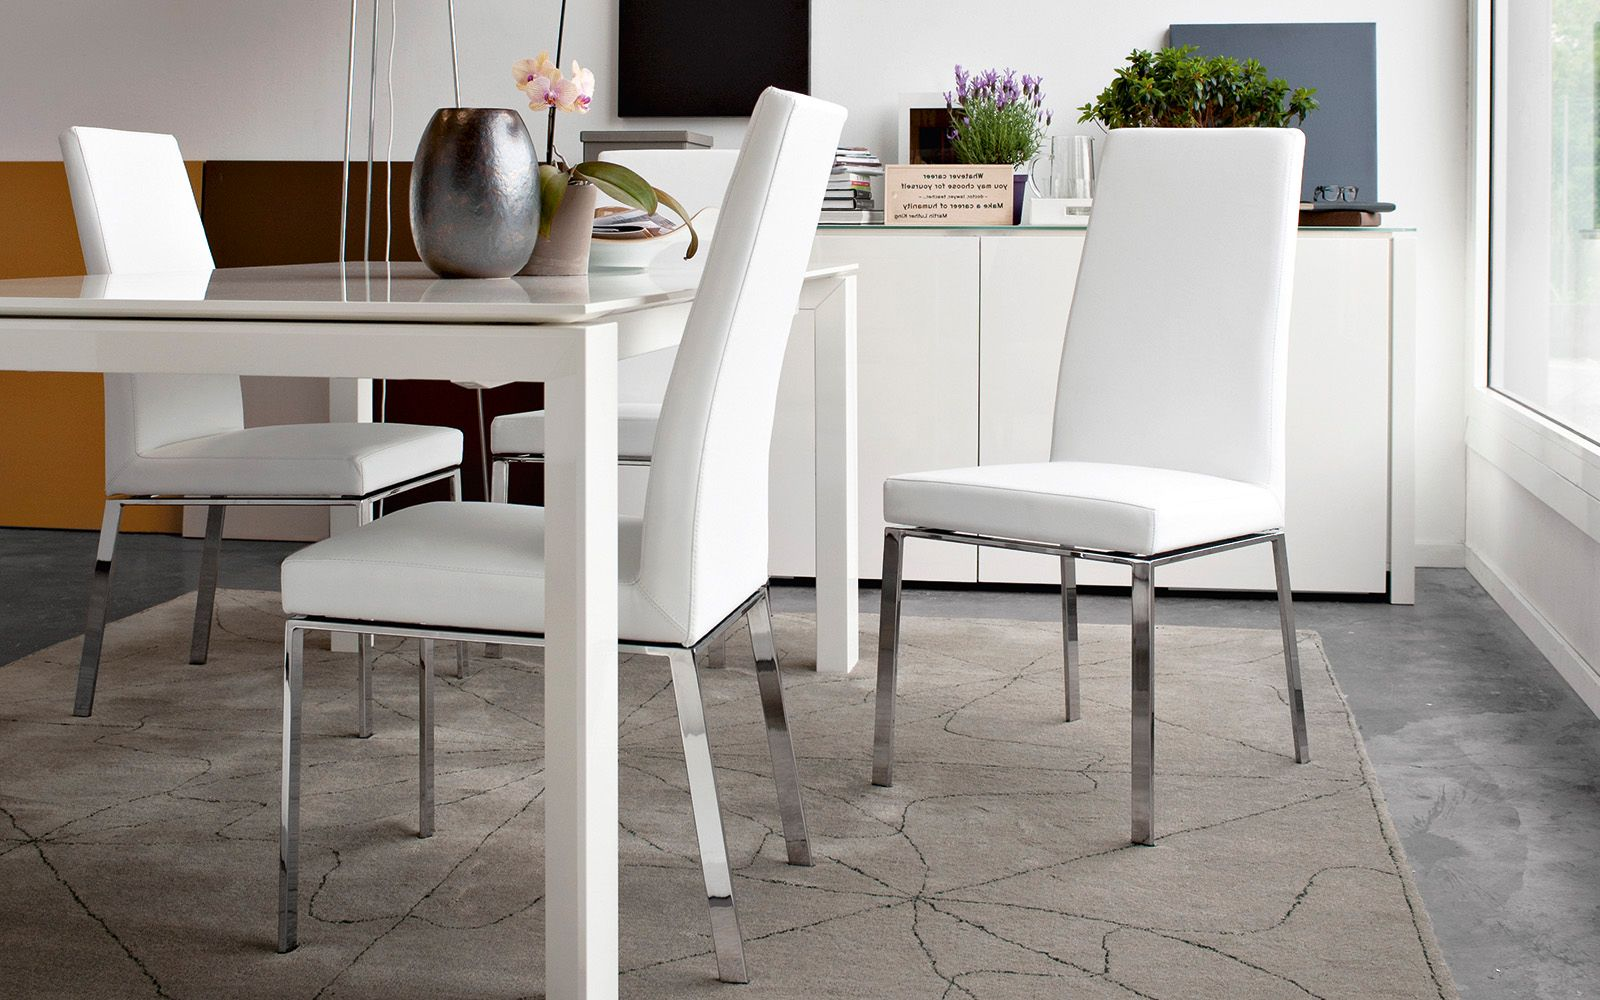 Sedie Sala Da Pranzo Calligaris : Sedia bess di calligaris sedie moderne chair furniture e